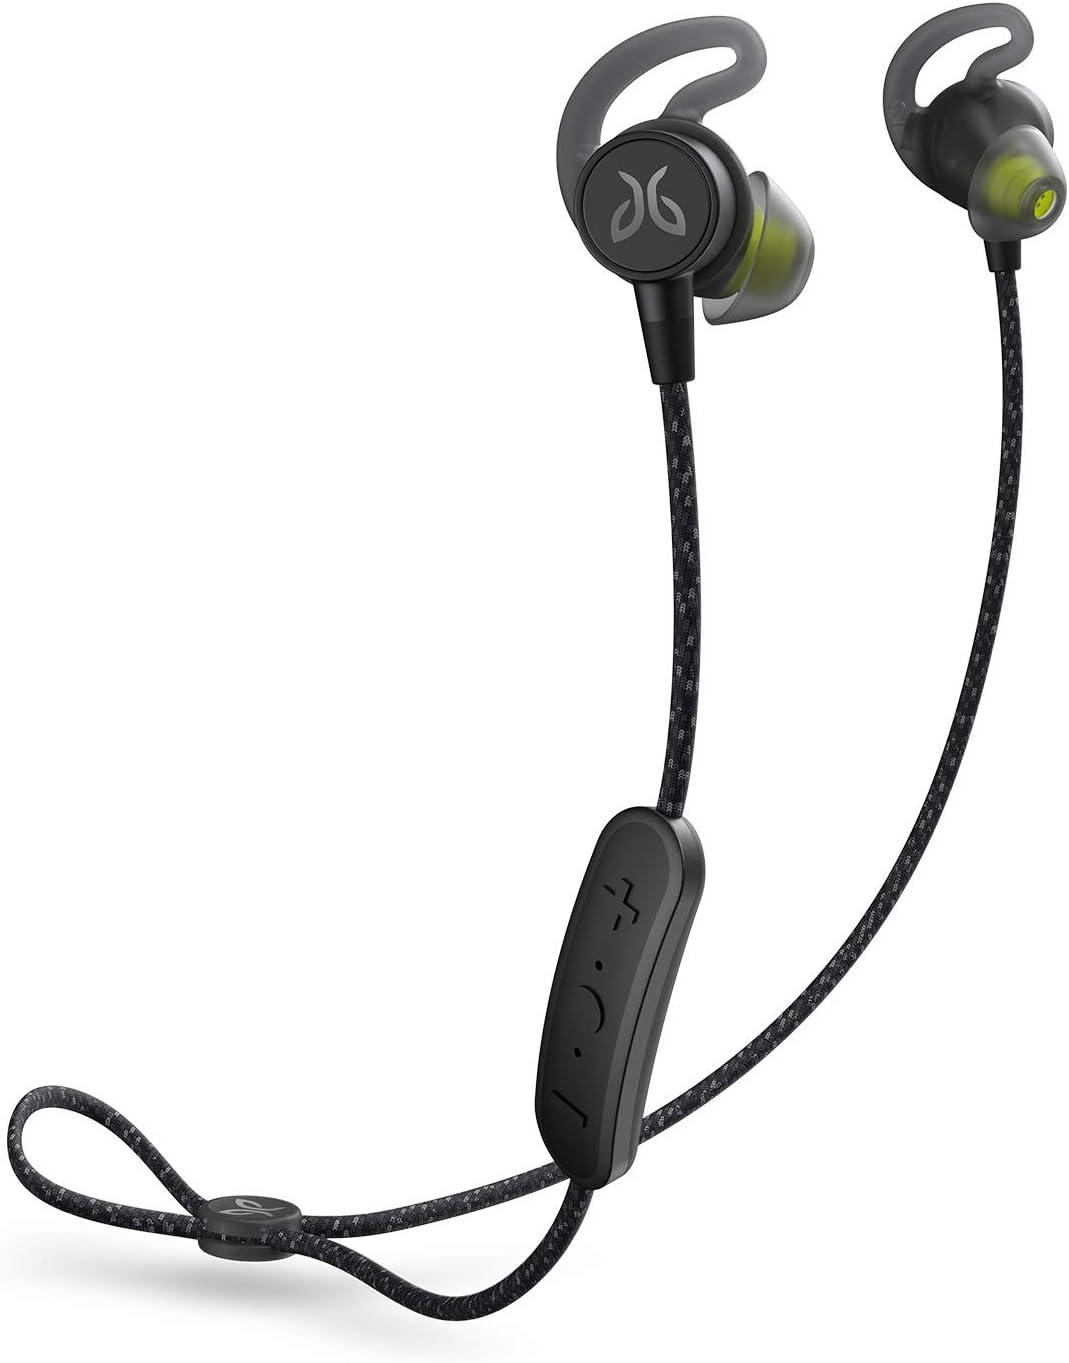 comprar mejor auricular deportivo